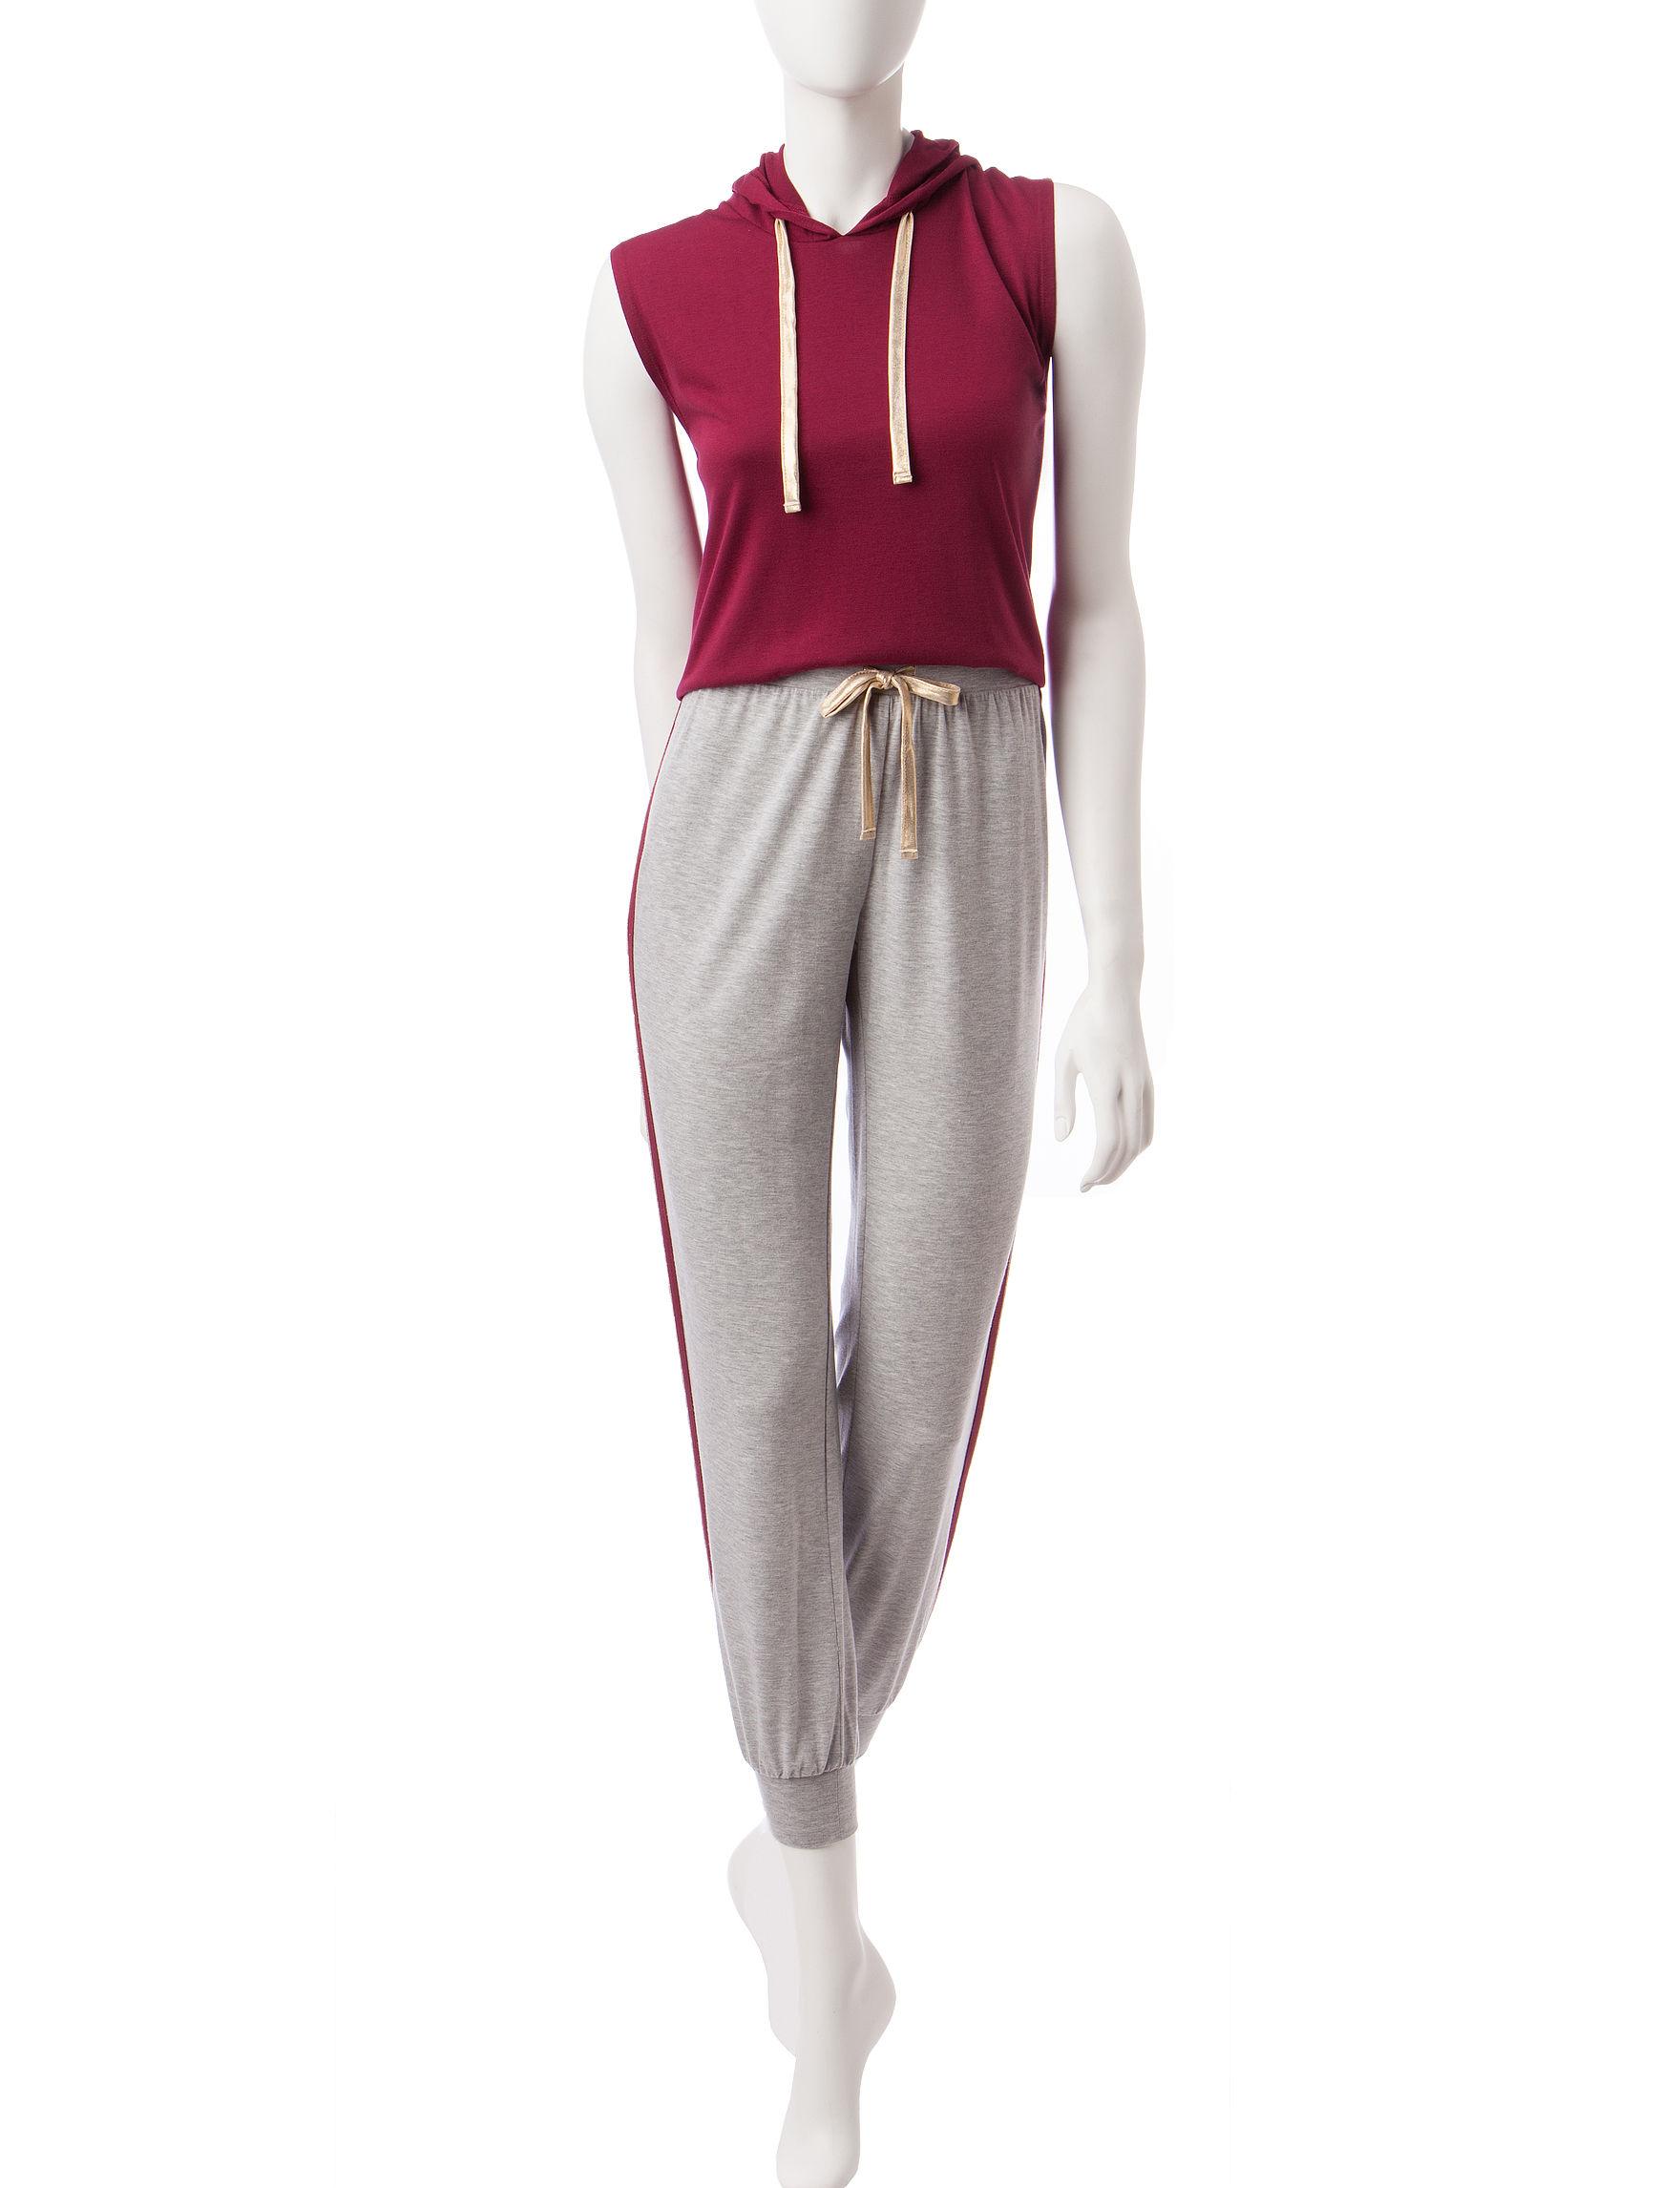 PJ Couture Berry Pajama Sets